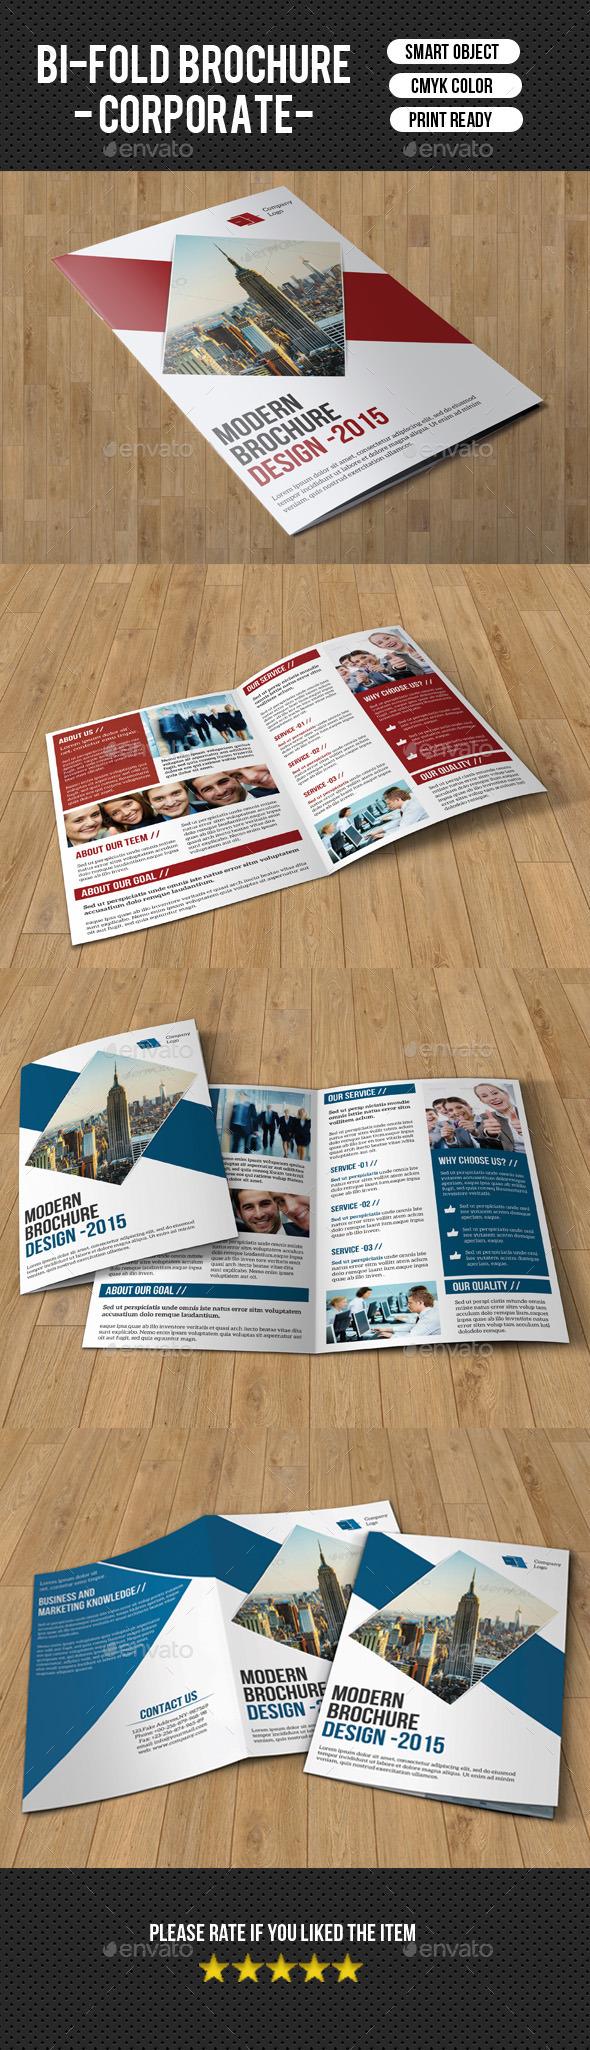 Bifold Brochure for Business-V155 - Corporate Brochures